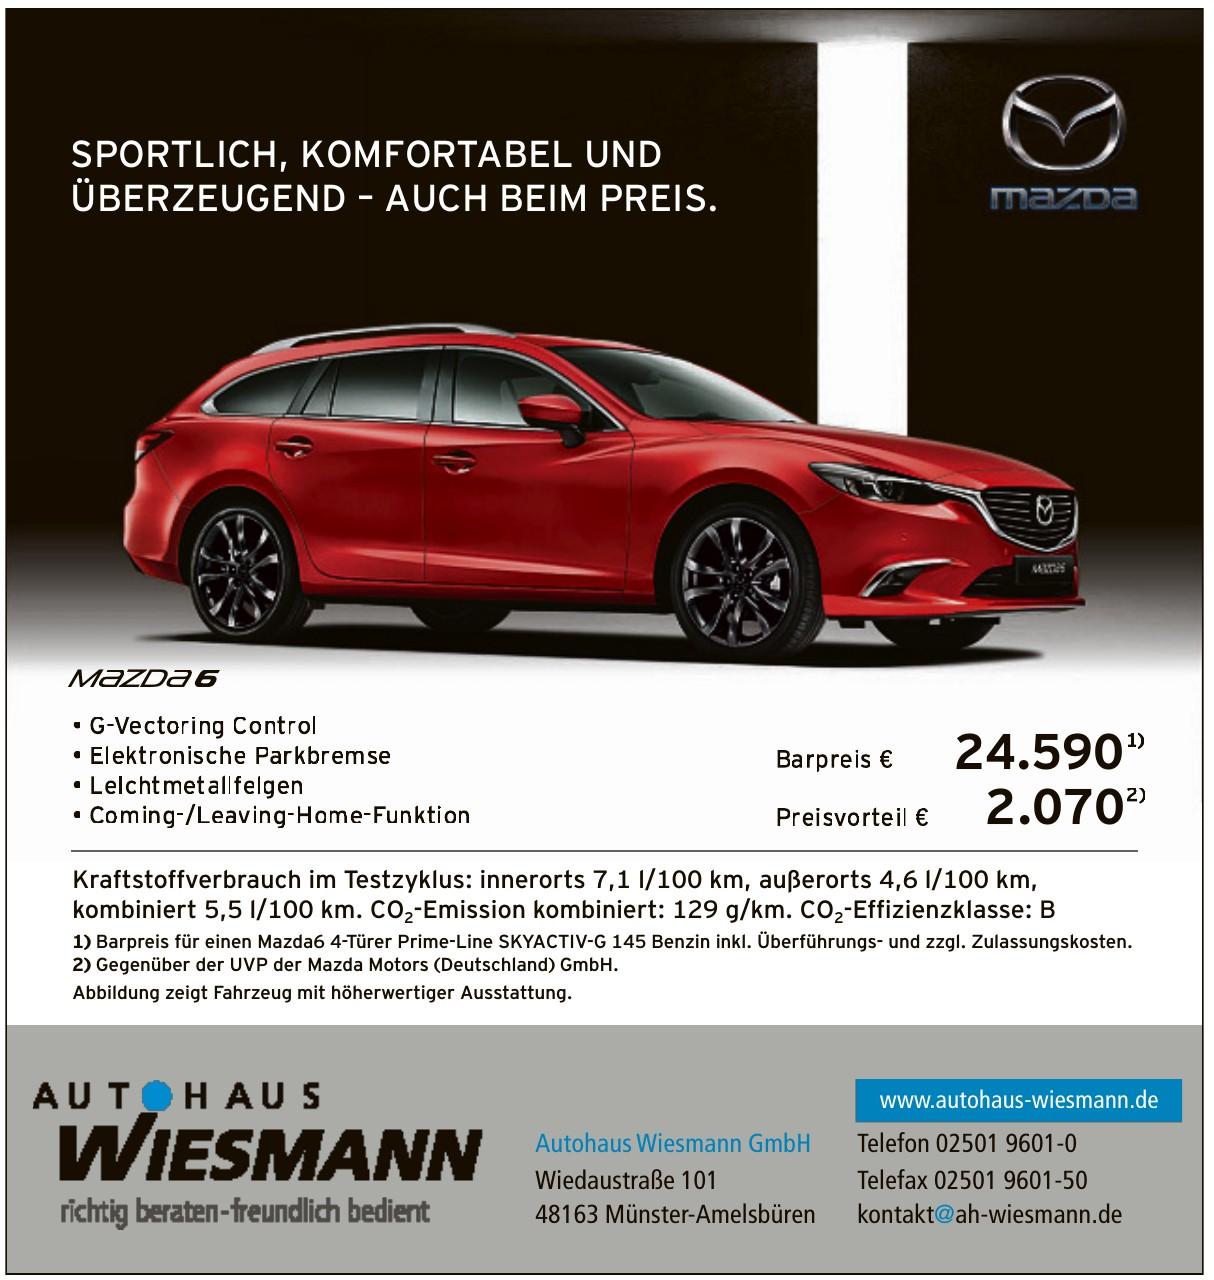 Autohaus Wiesmann GmbH